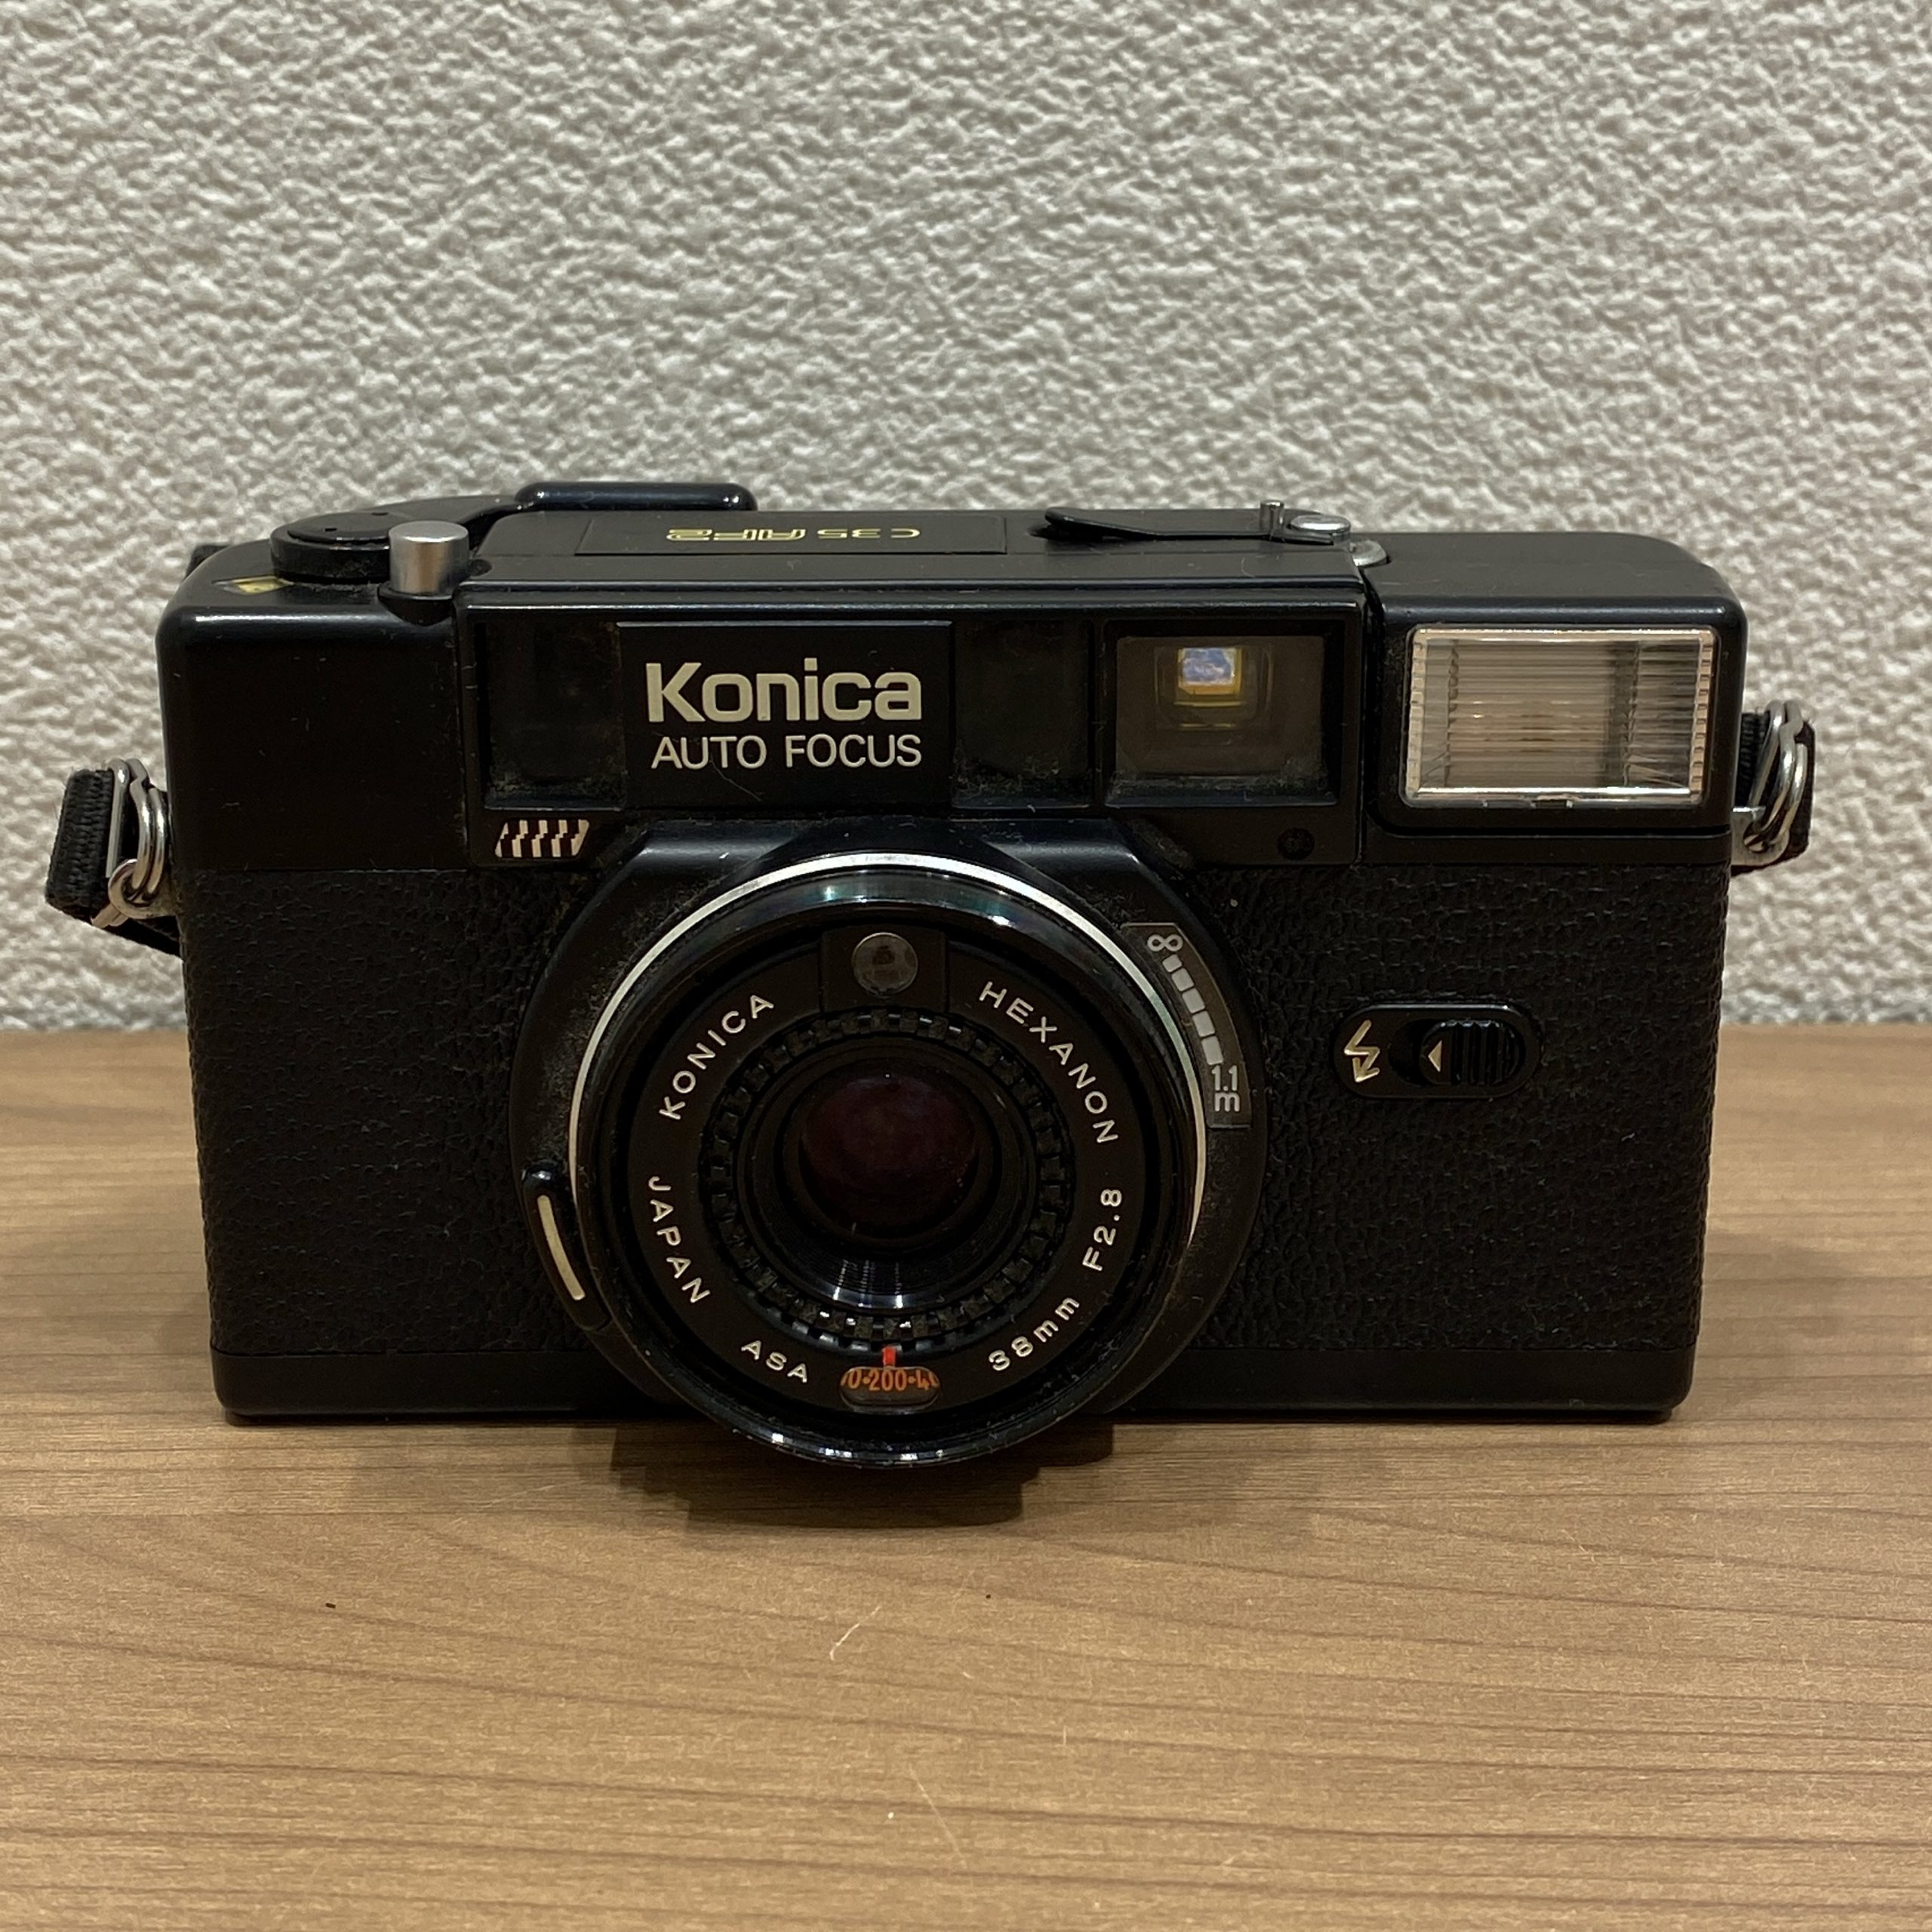 【Konica/コニカ】C 35 オートフォーカス/AF フィルムカメラ